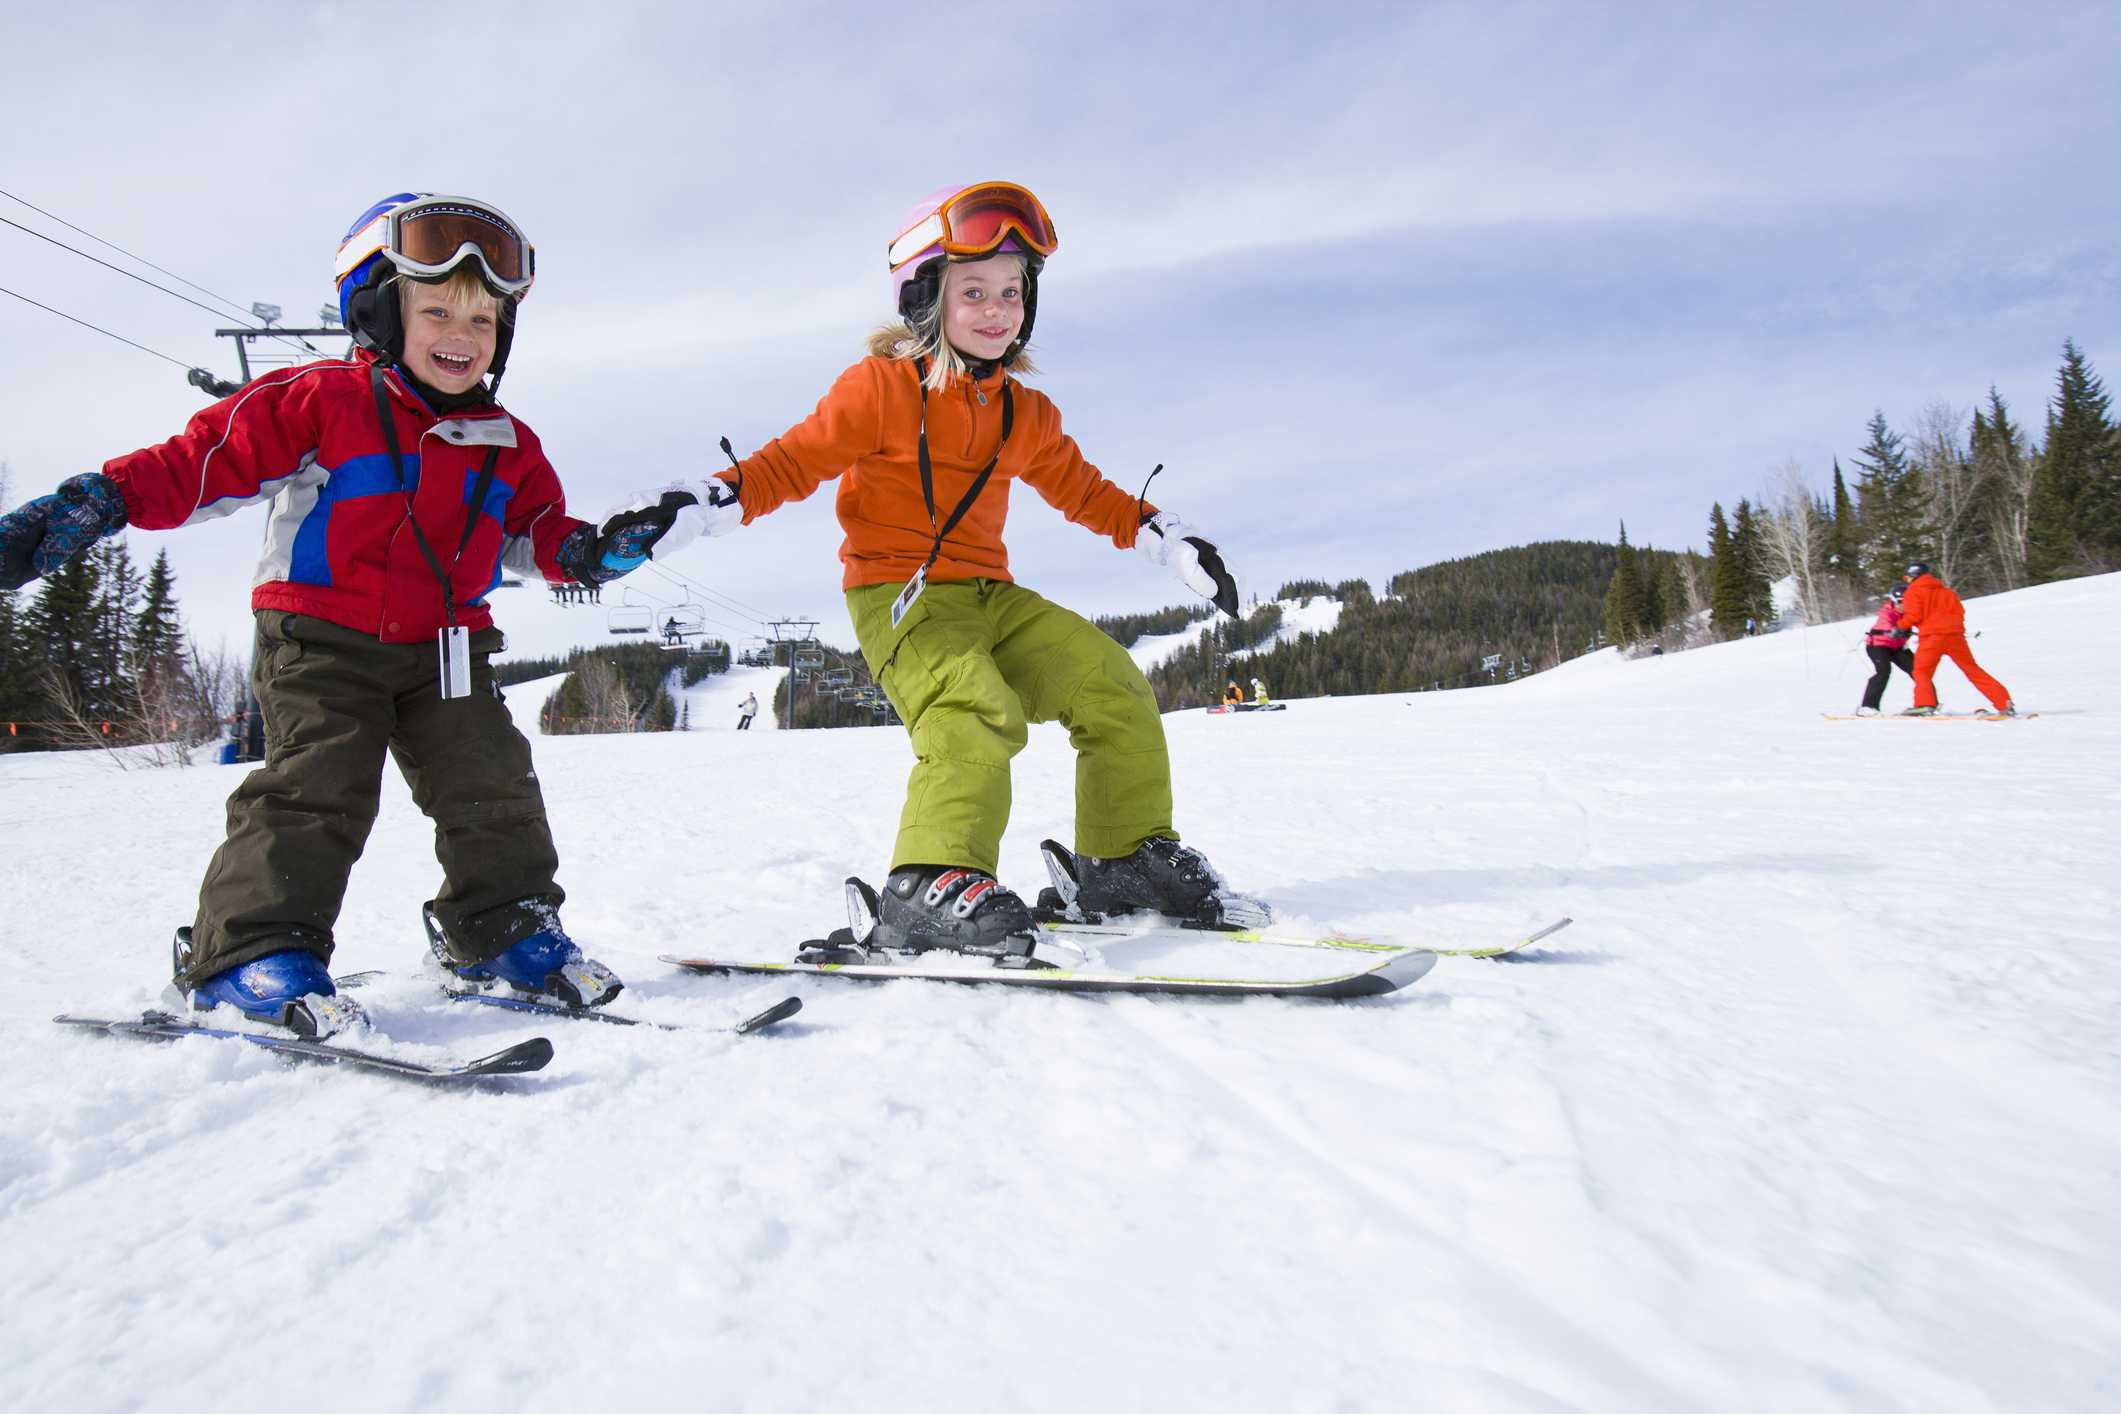 Two kids skiing